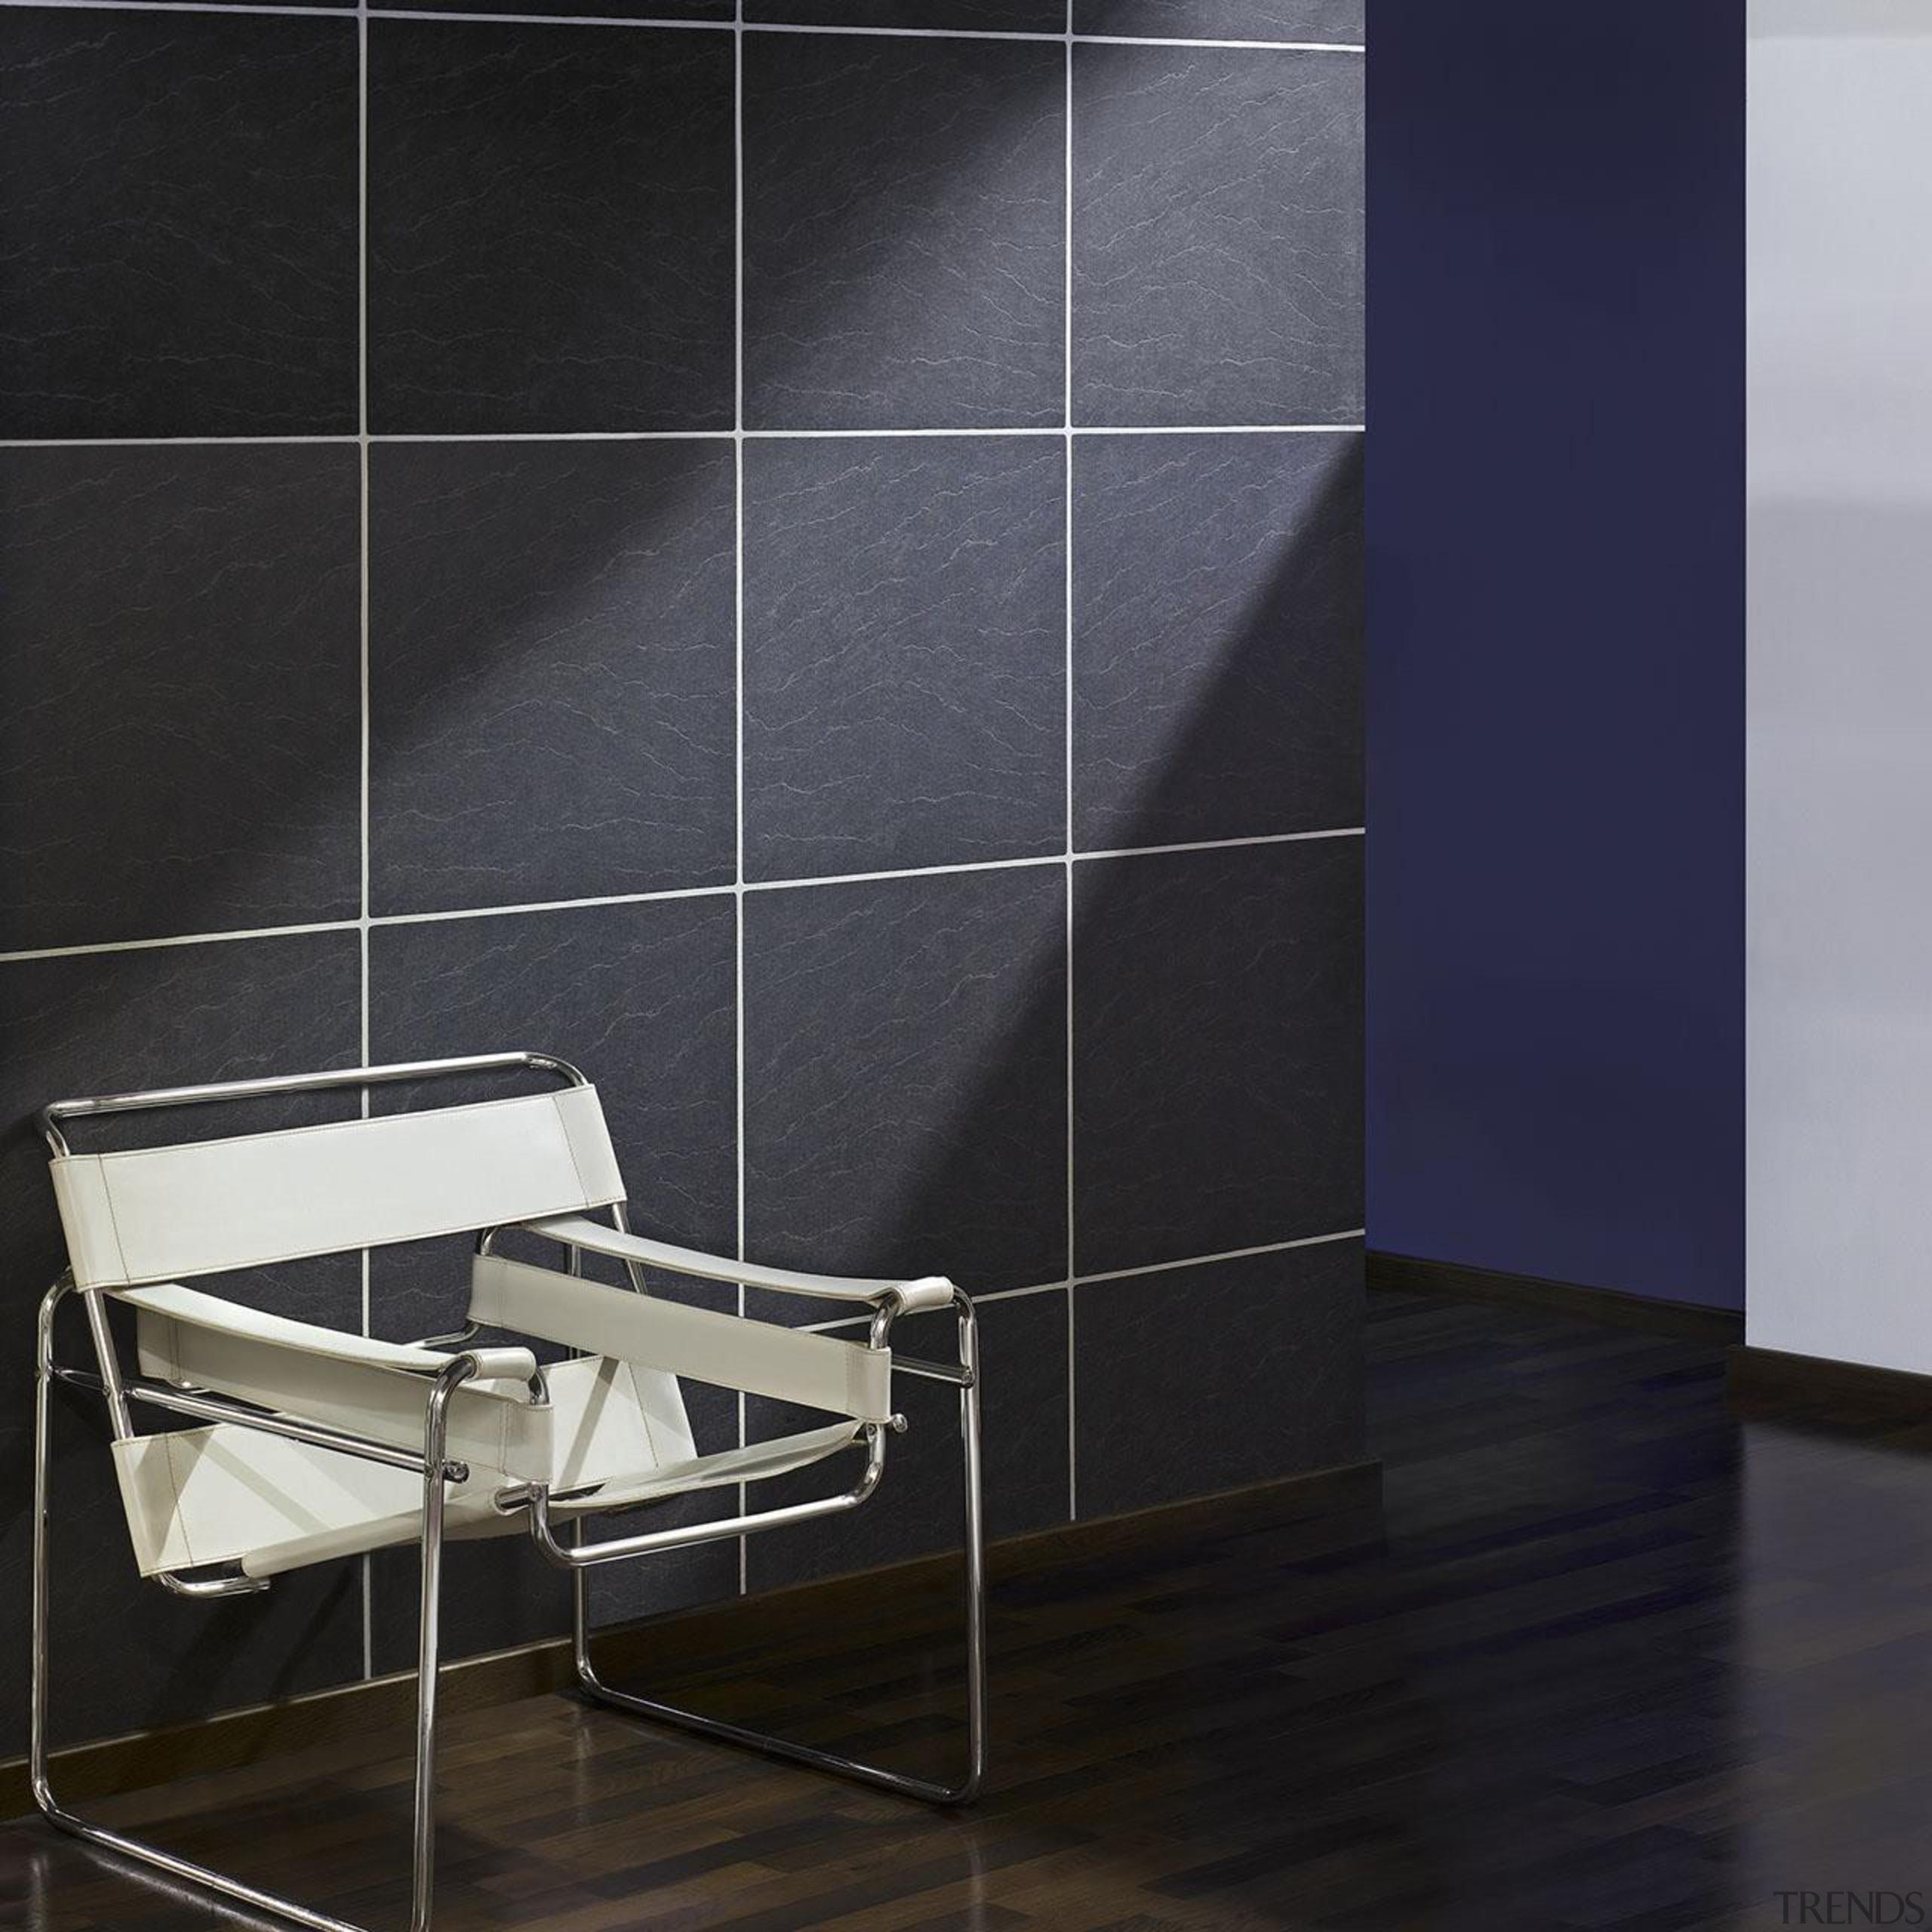 Modern Style Range - angle   floor   angle, floor, flooring, furniture, glass, interior design, product design, tap, tile, wall, black